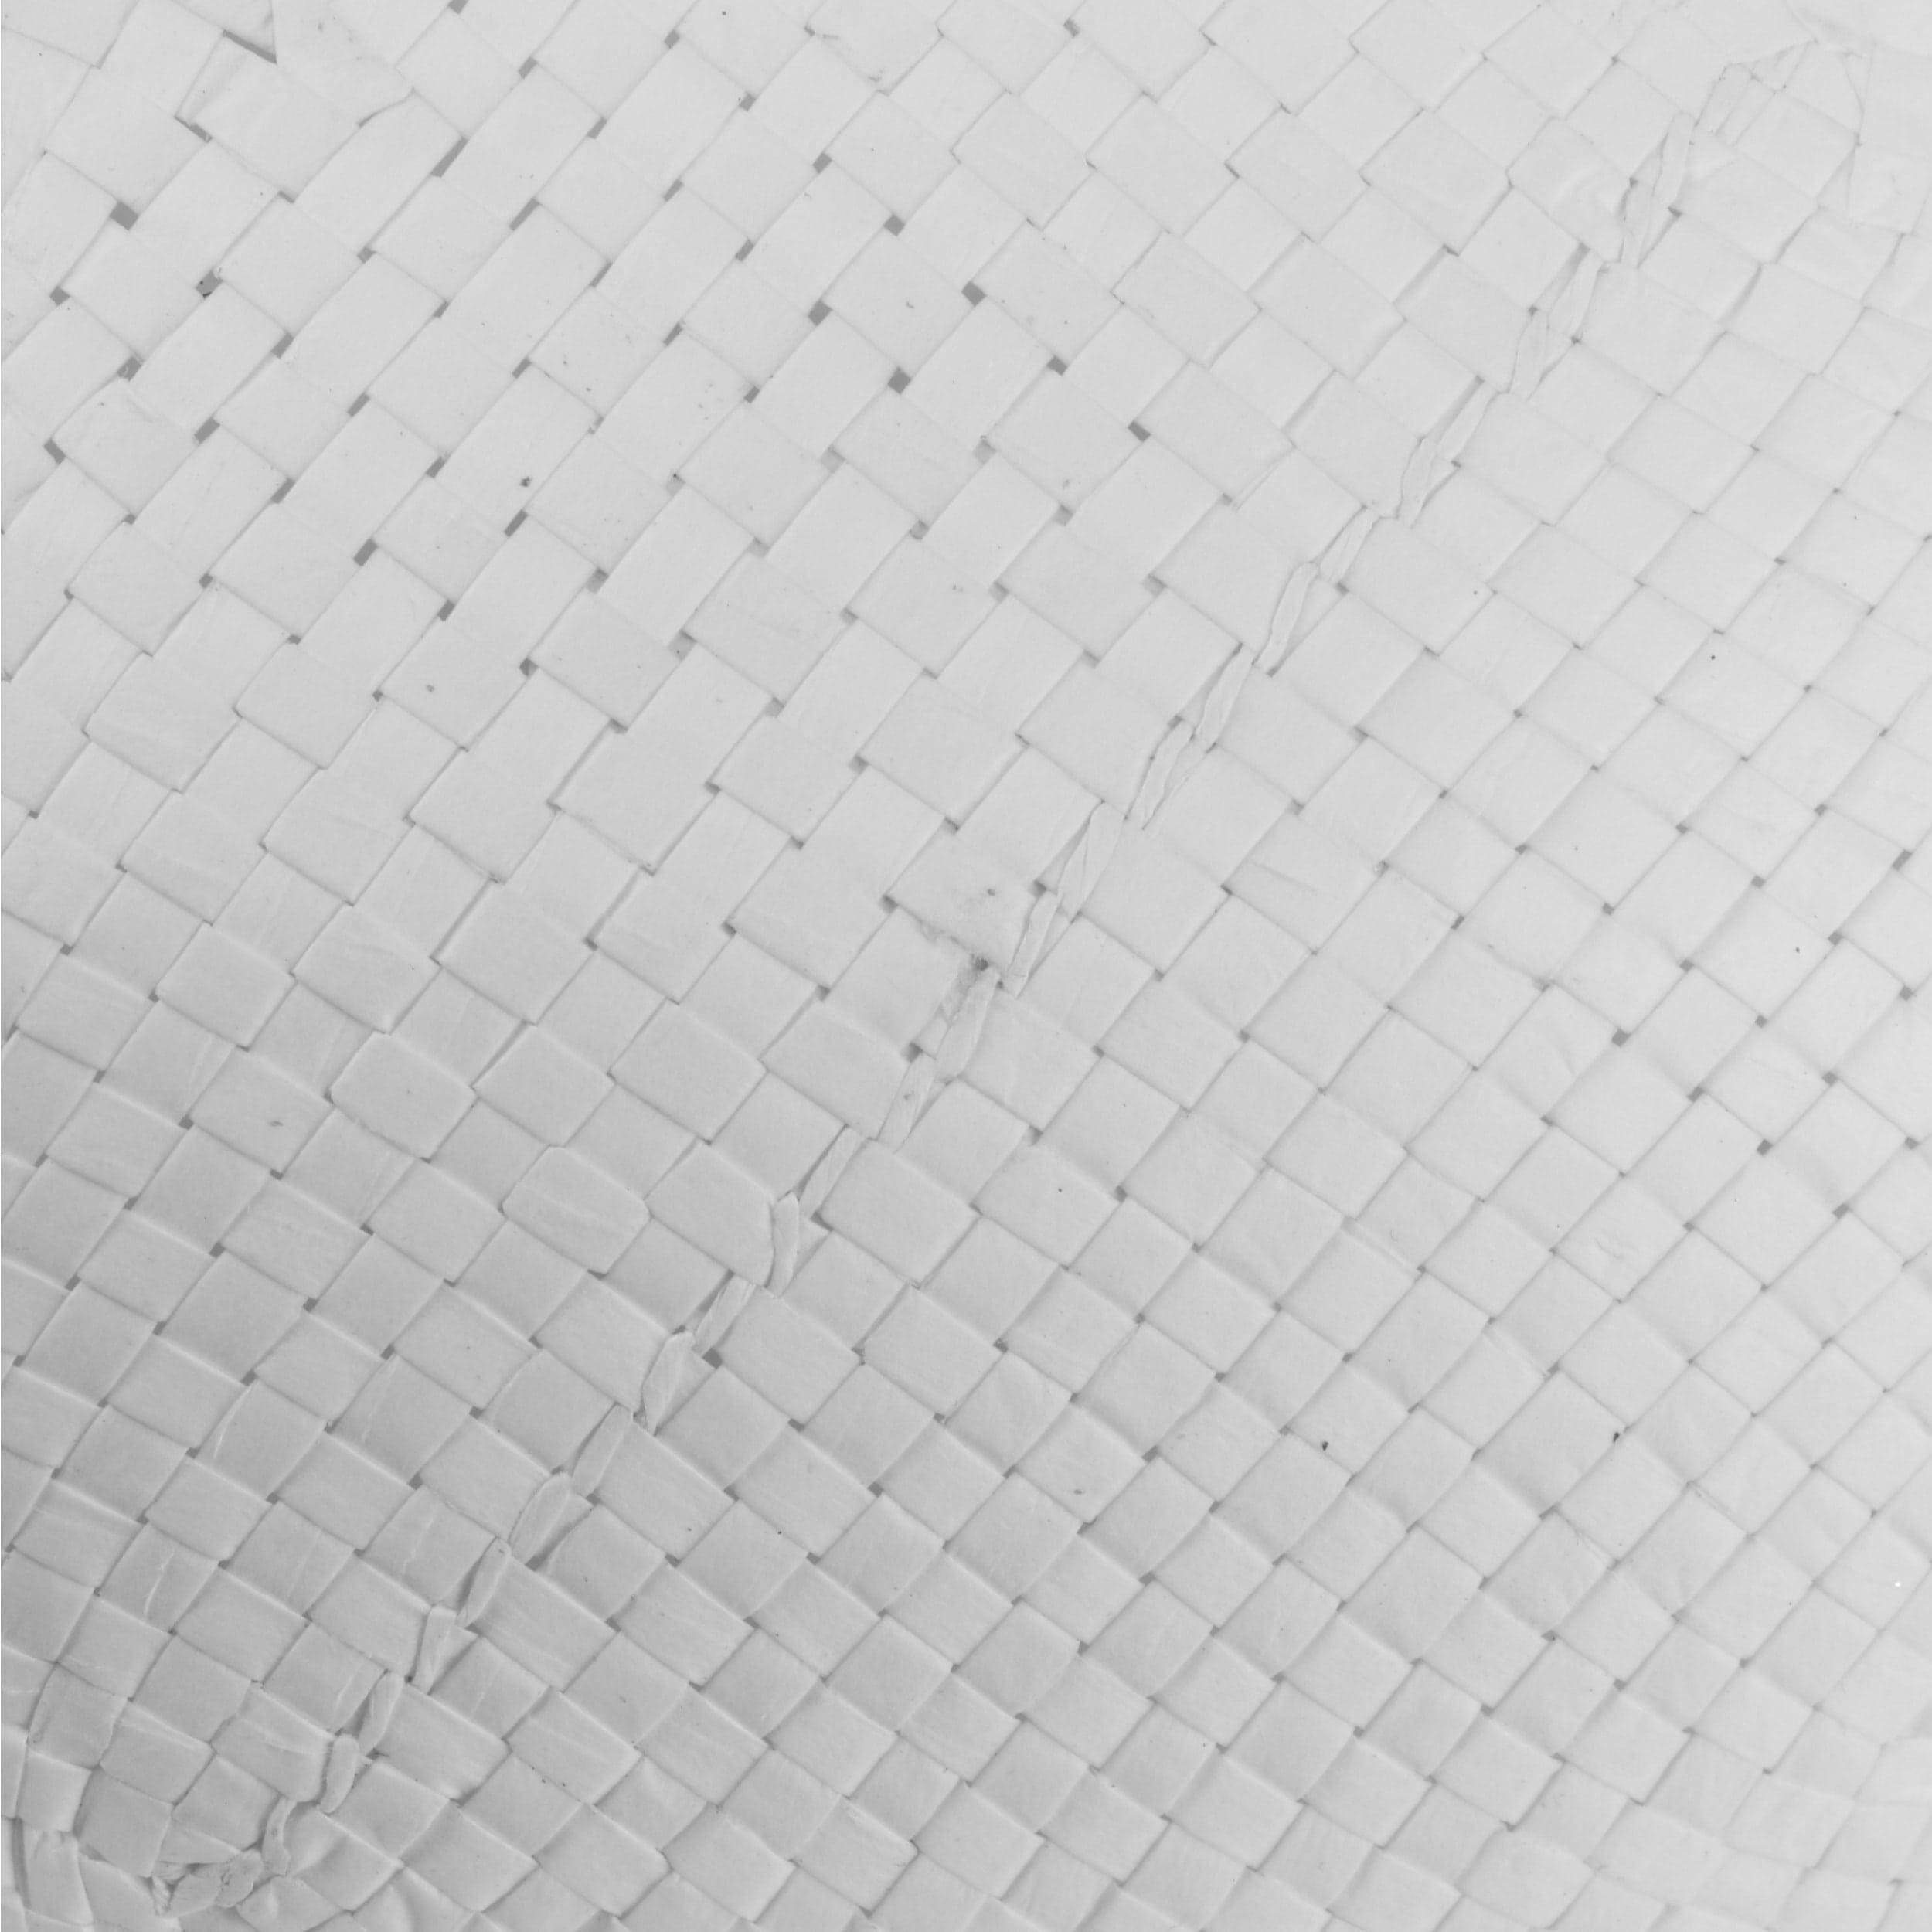 237de773ef3 ... Acapulco White Pork Pie Hat by Lipodo - white 3 ...